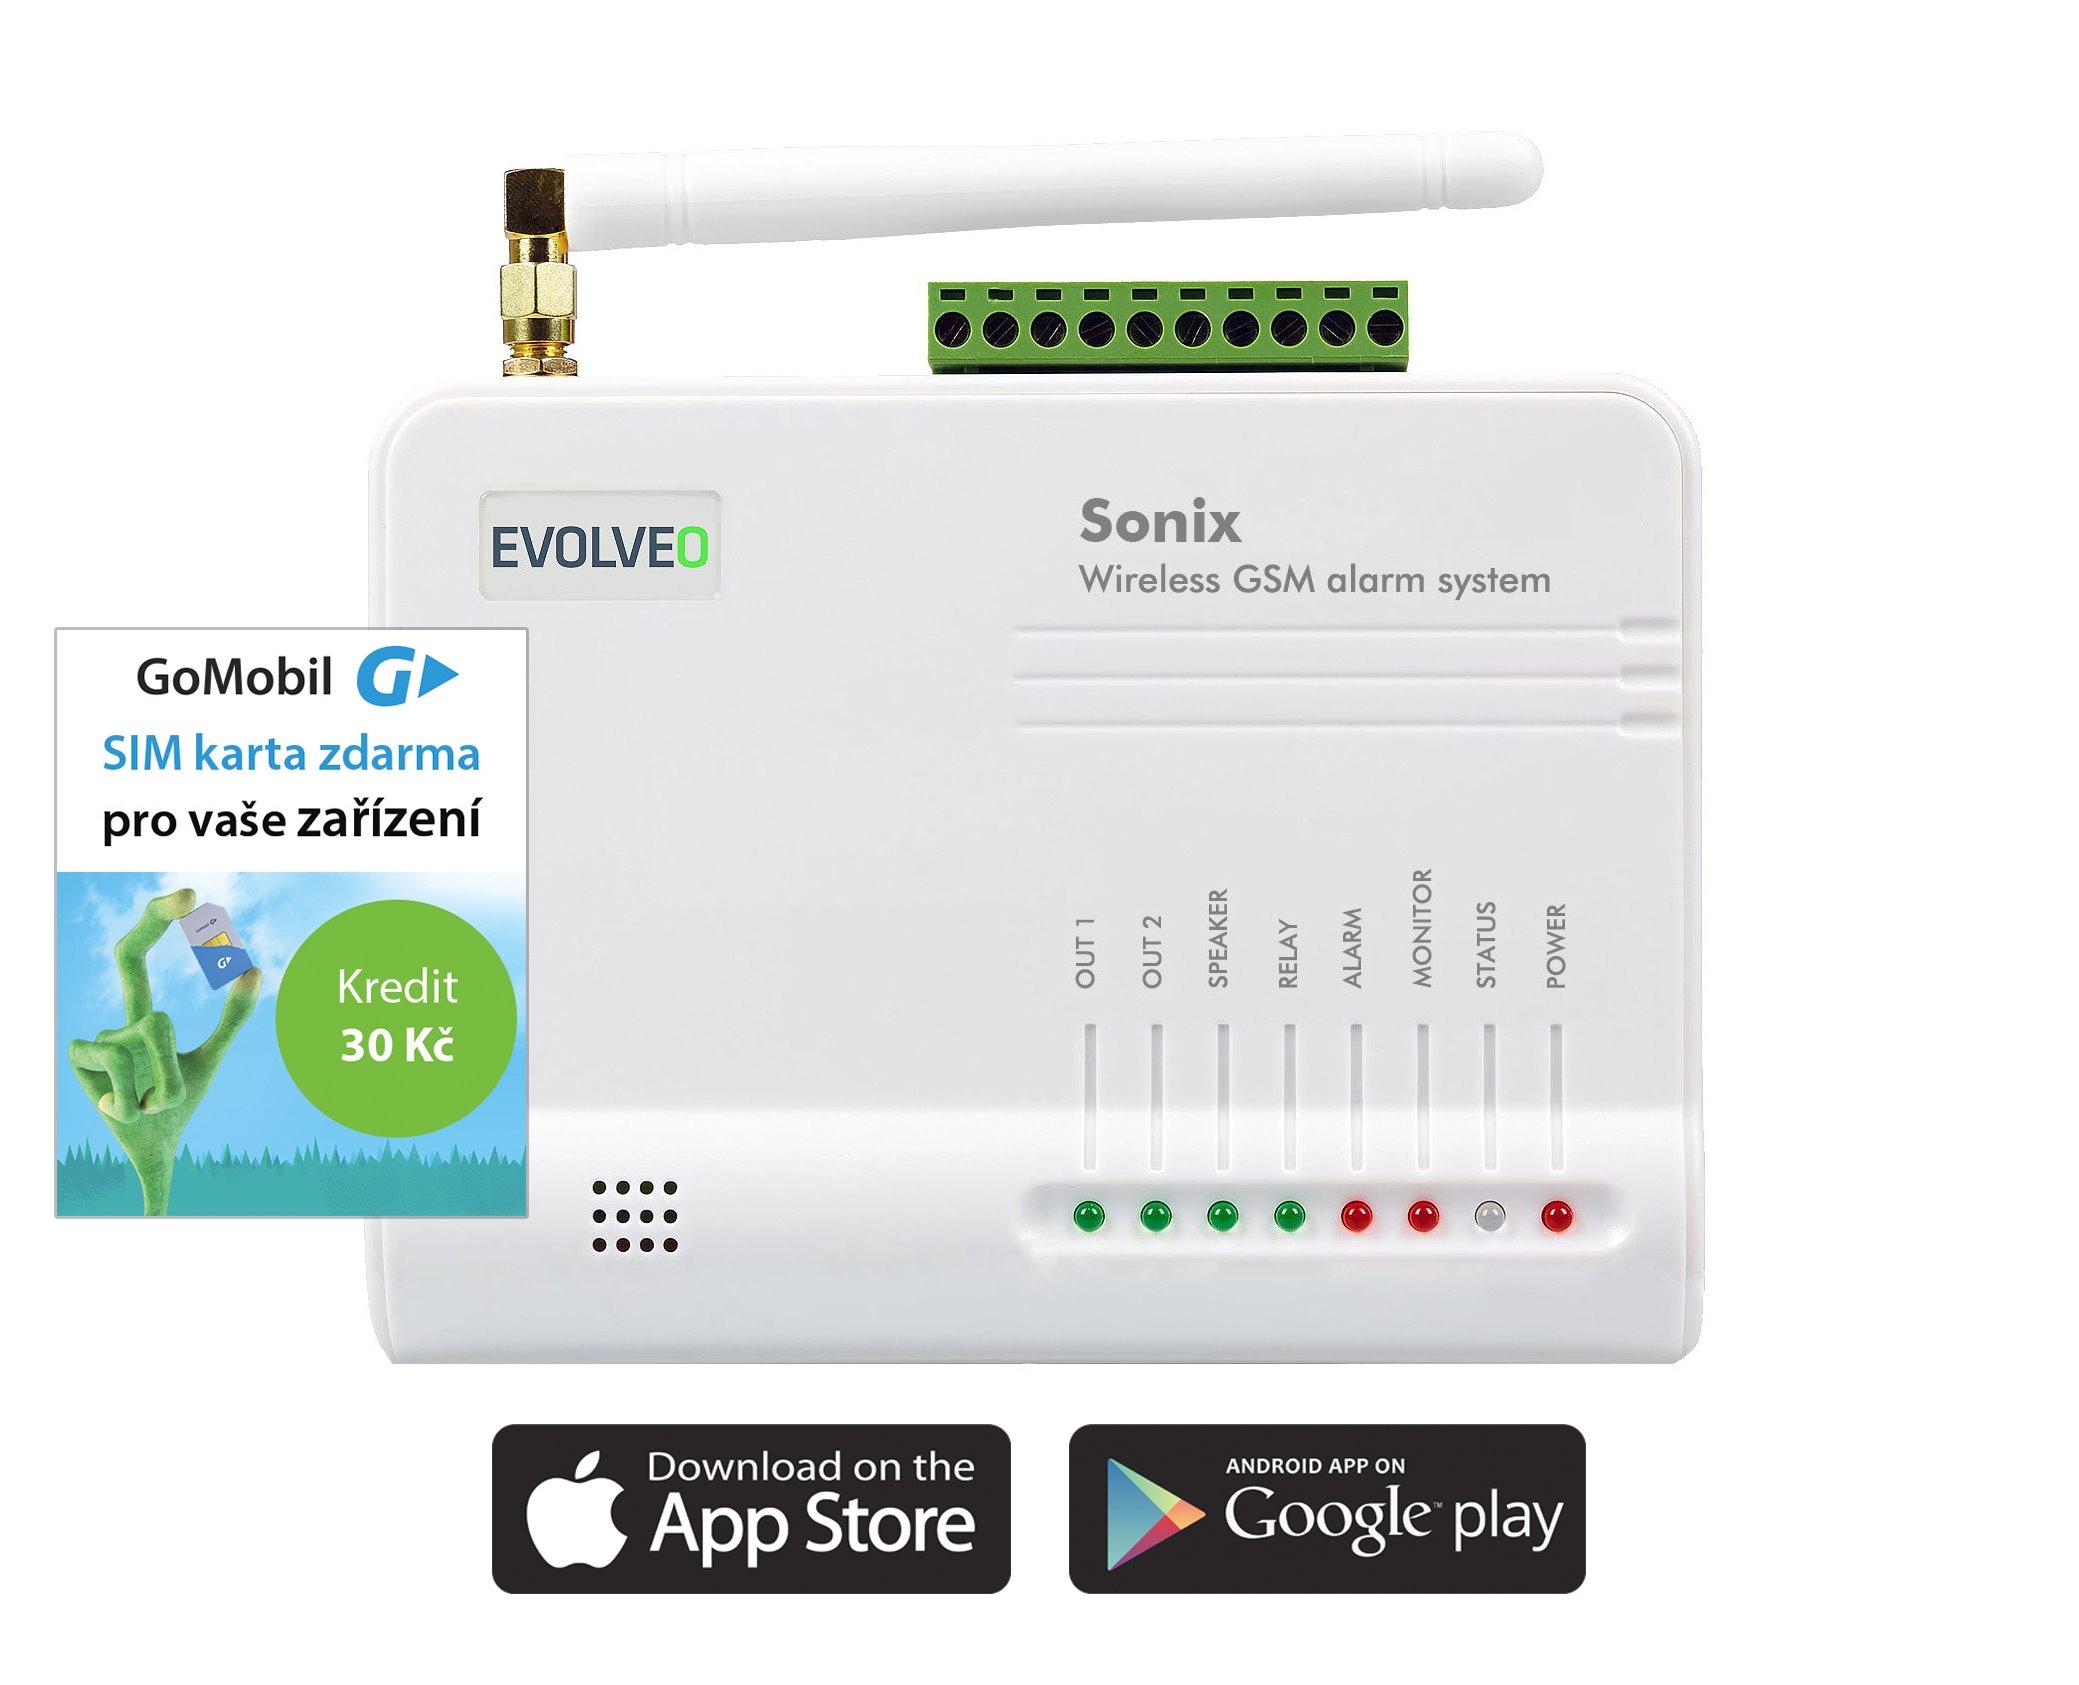 EVOLVEO Sonix - Android/iPhone GSM alarm ALM301